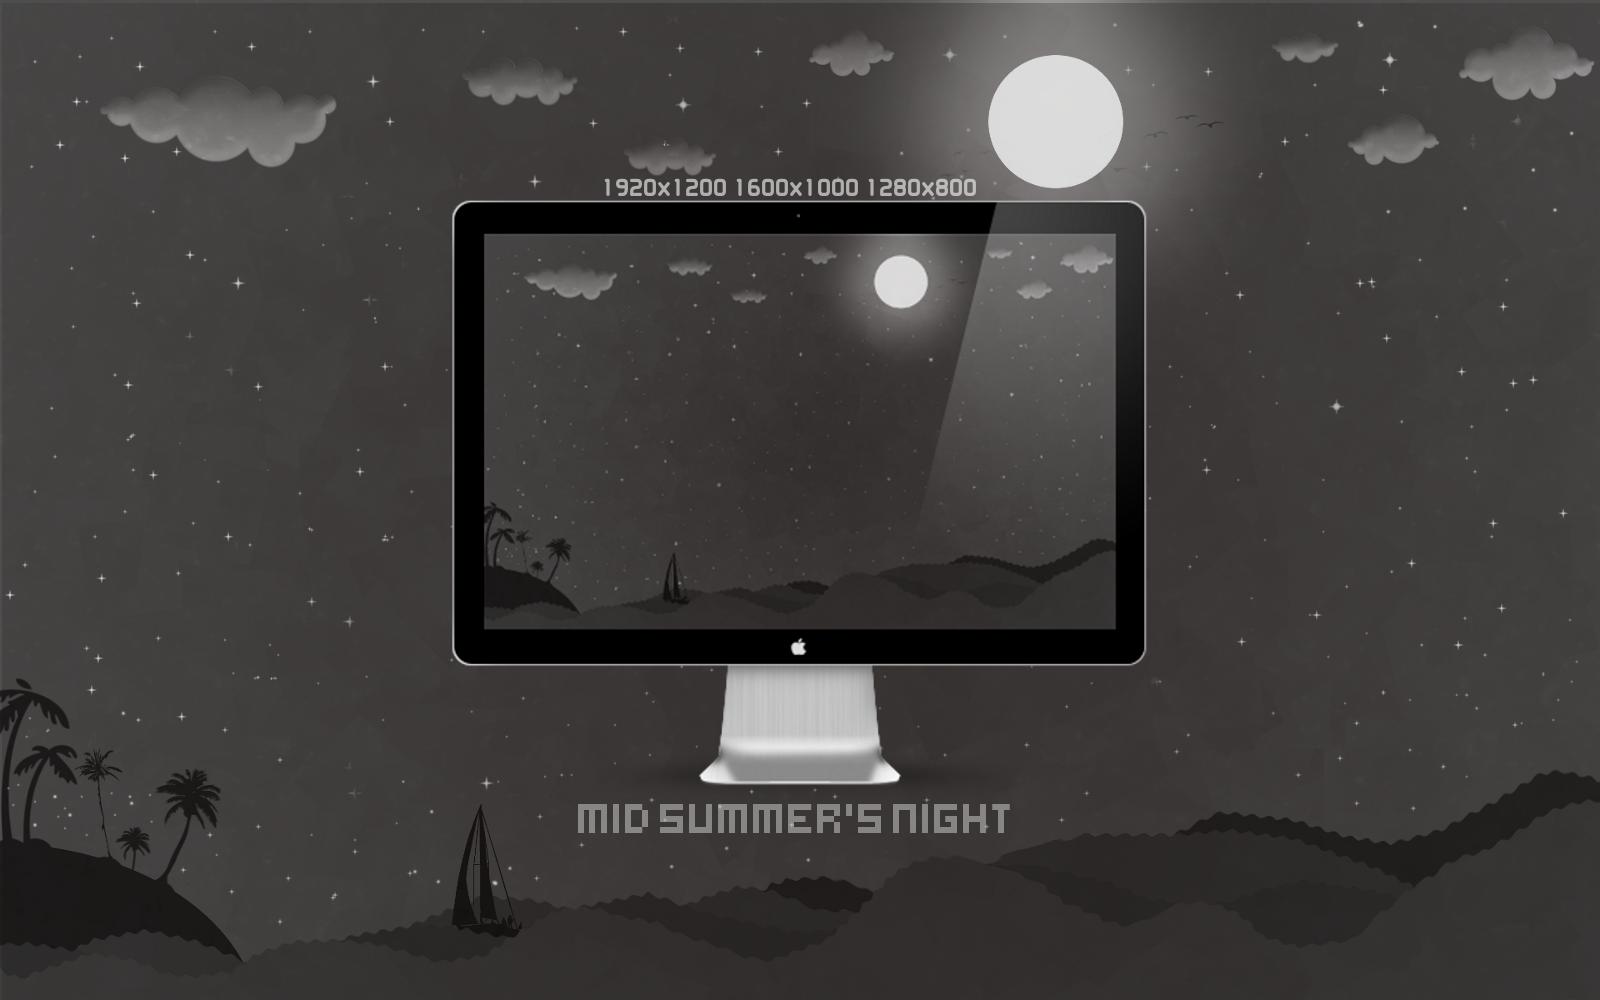 Mid Summer's Night by g0rg0d